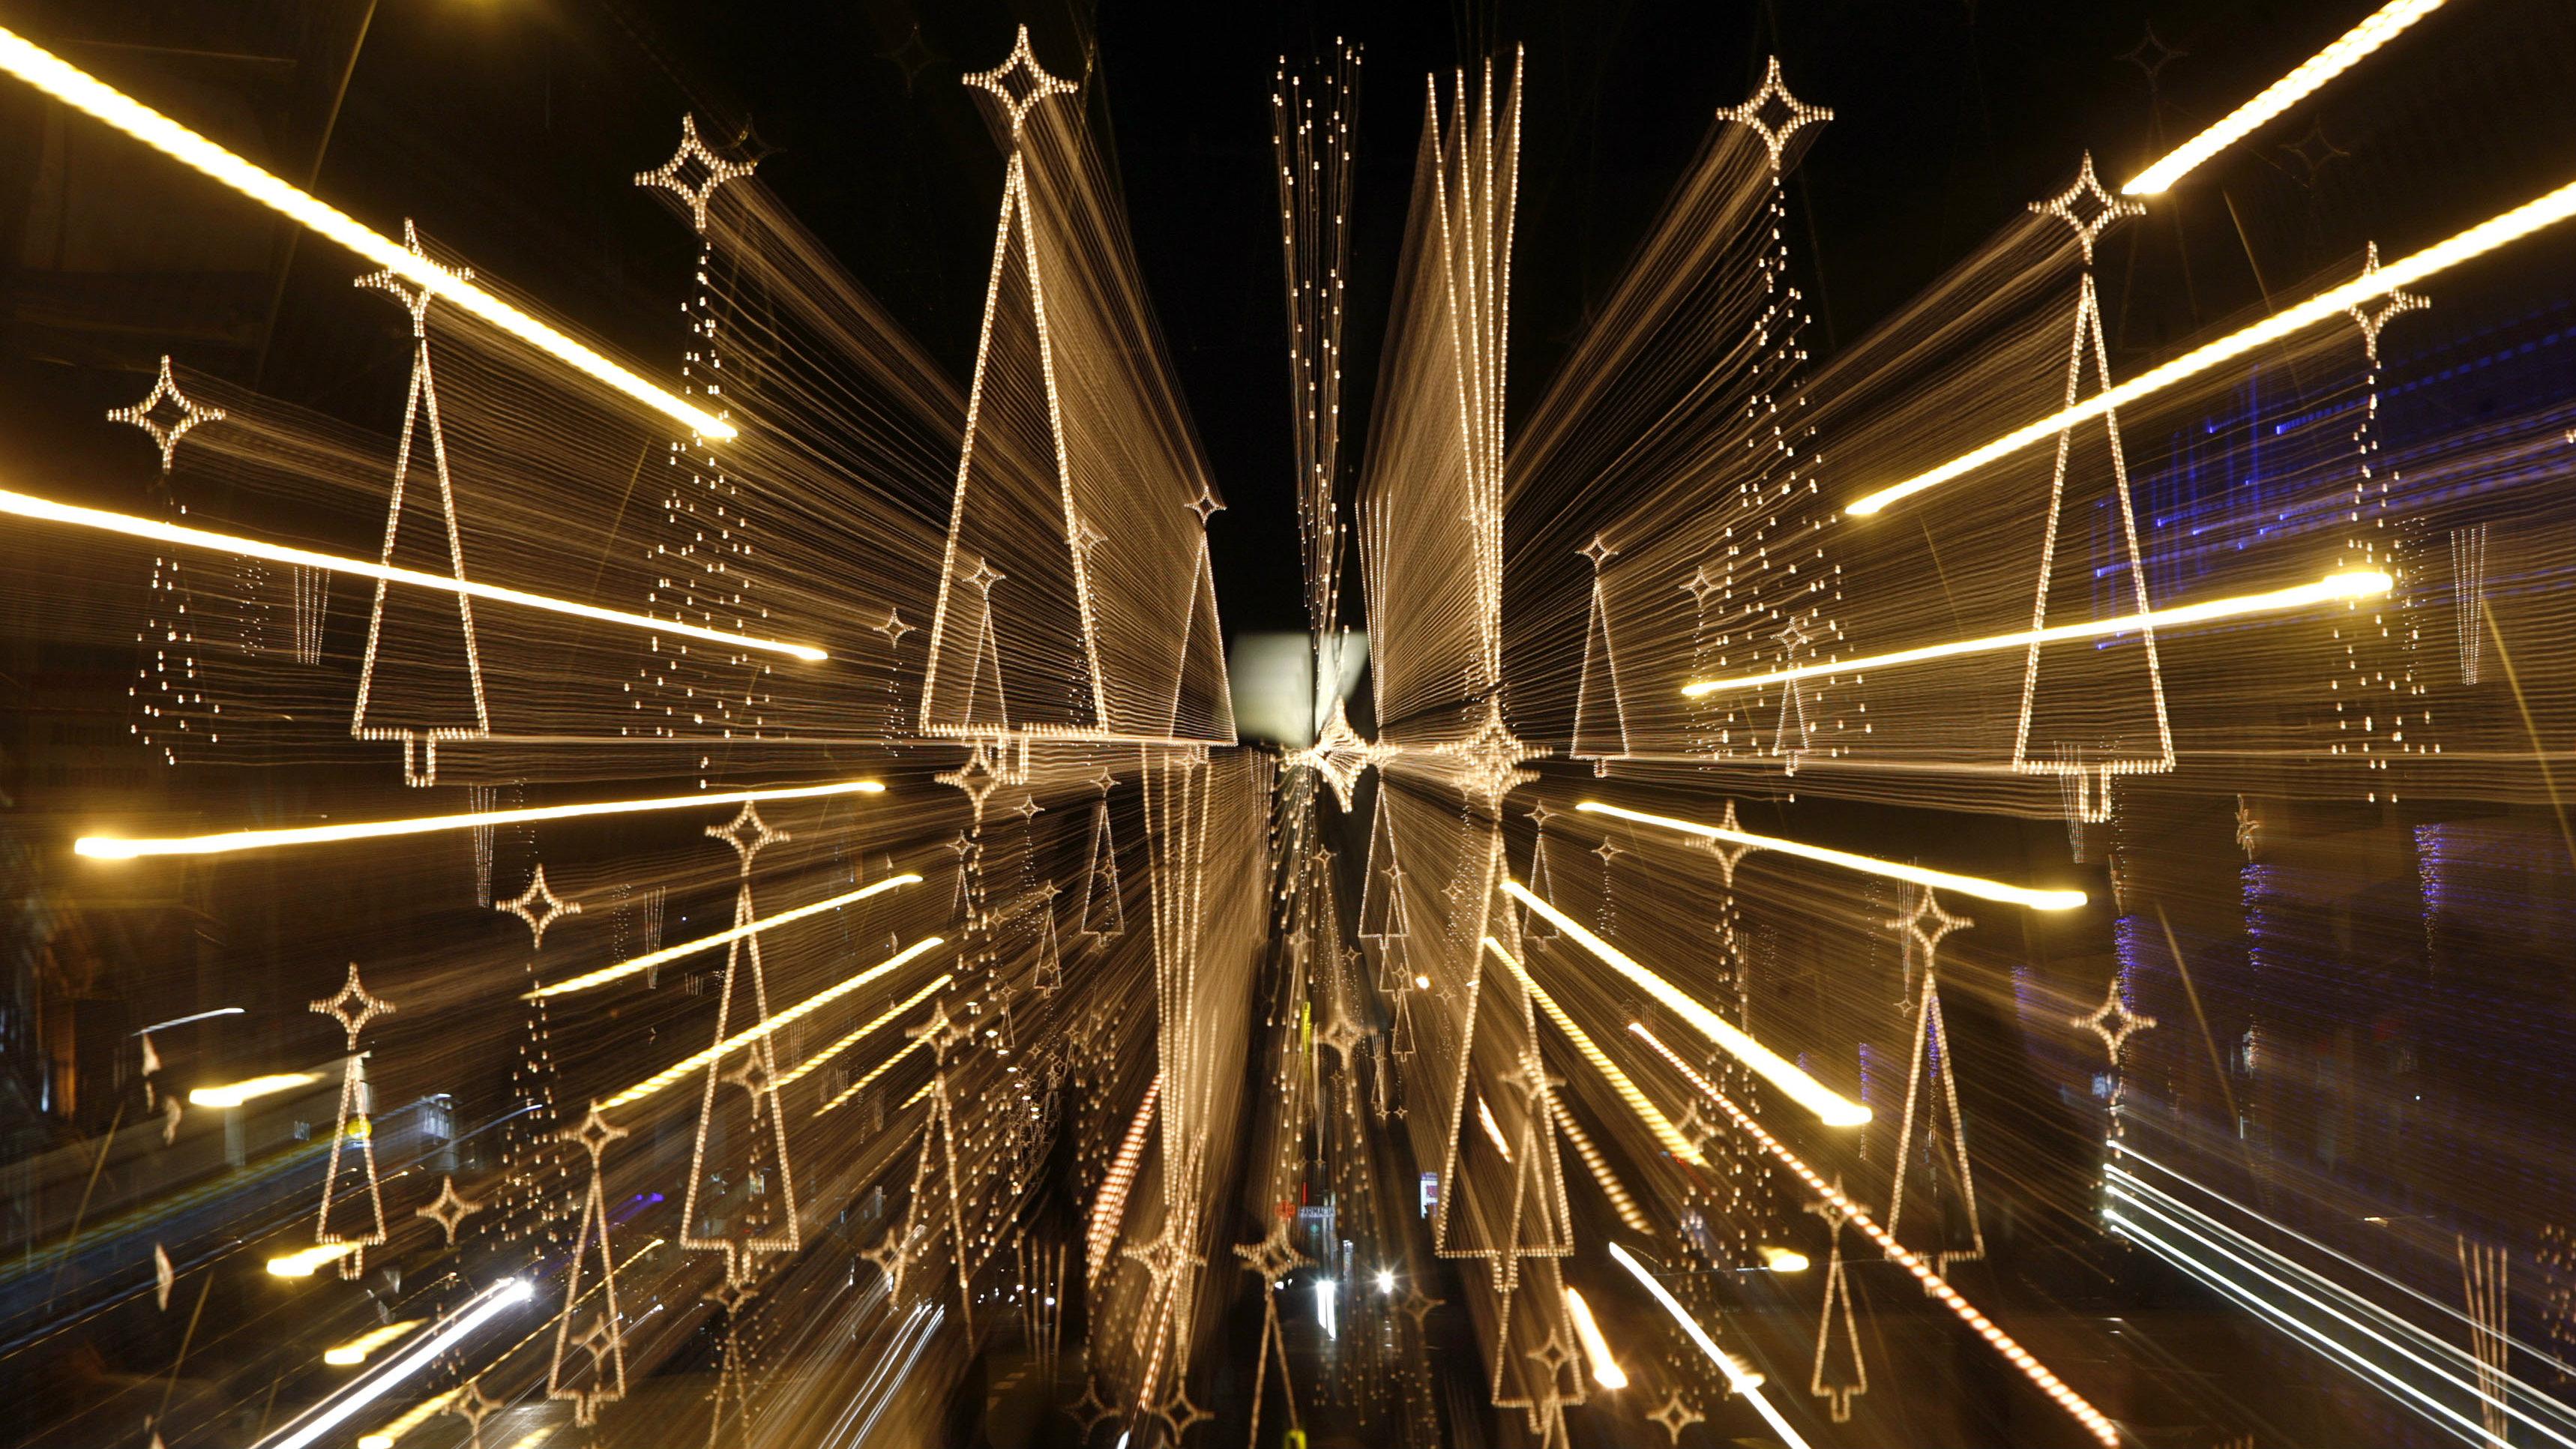 Christmas lights illuminate Pelai Street in central Barcelona